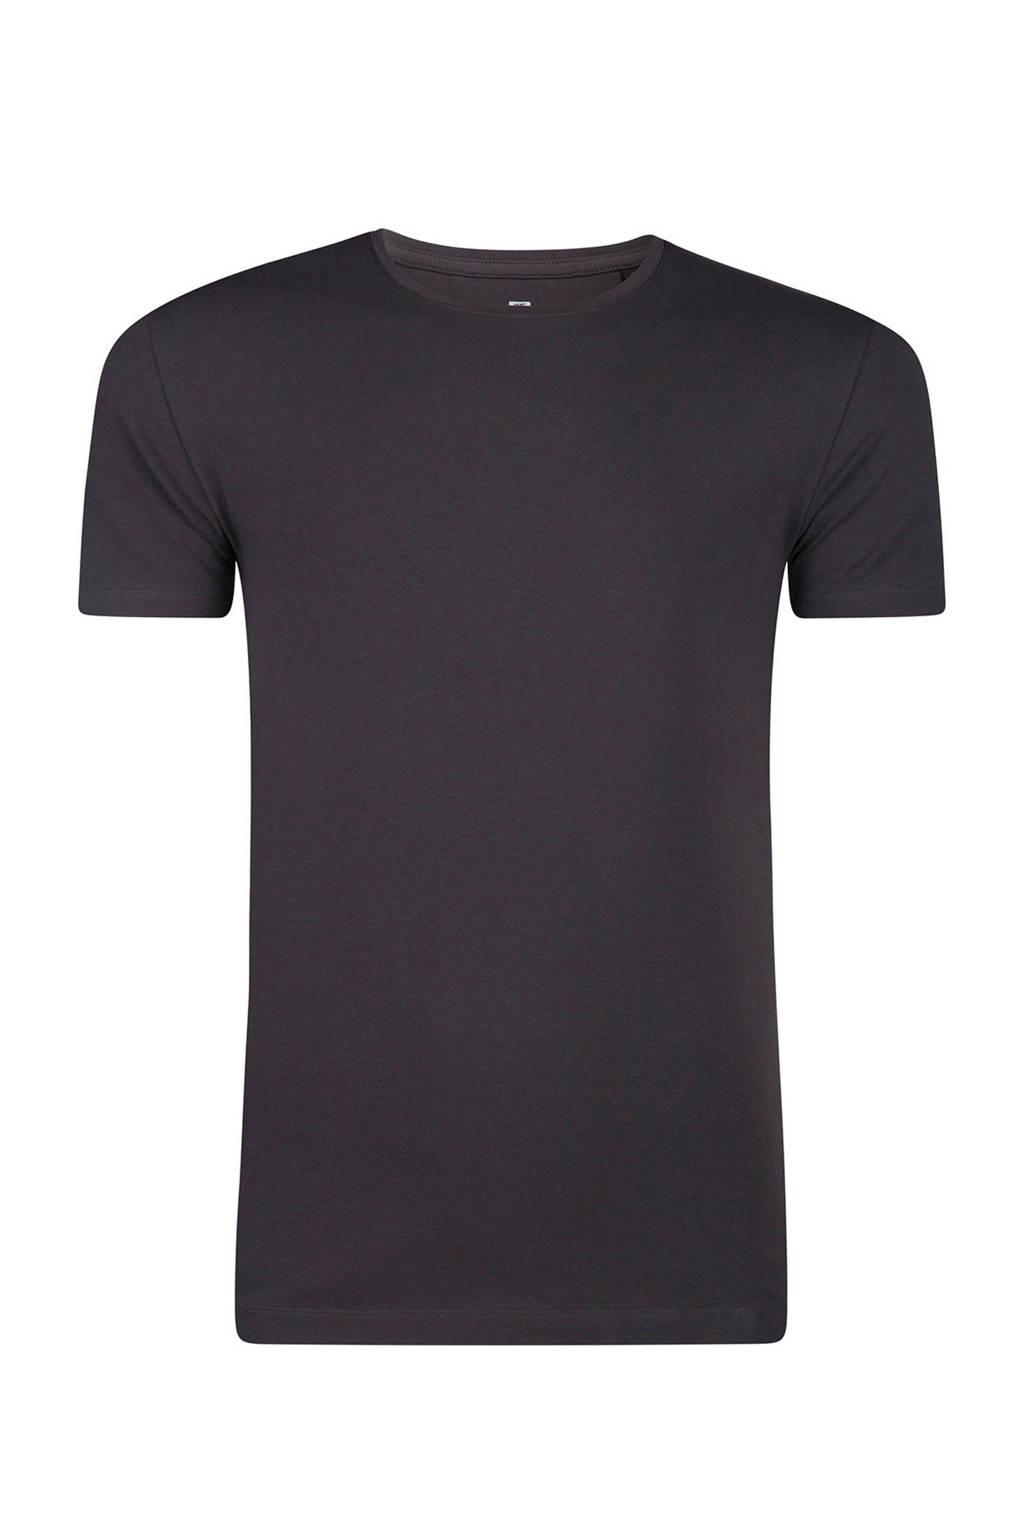 WE Fashion T-shirt, Grijs